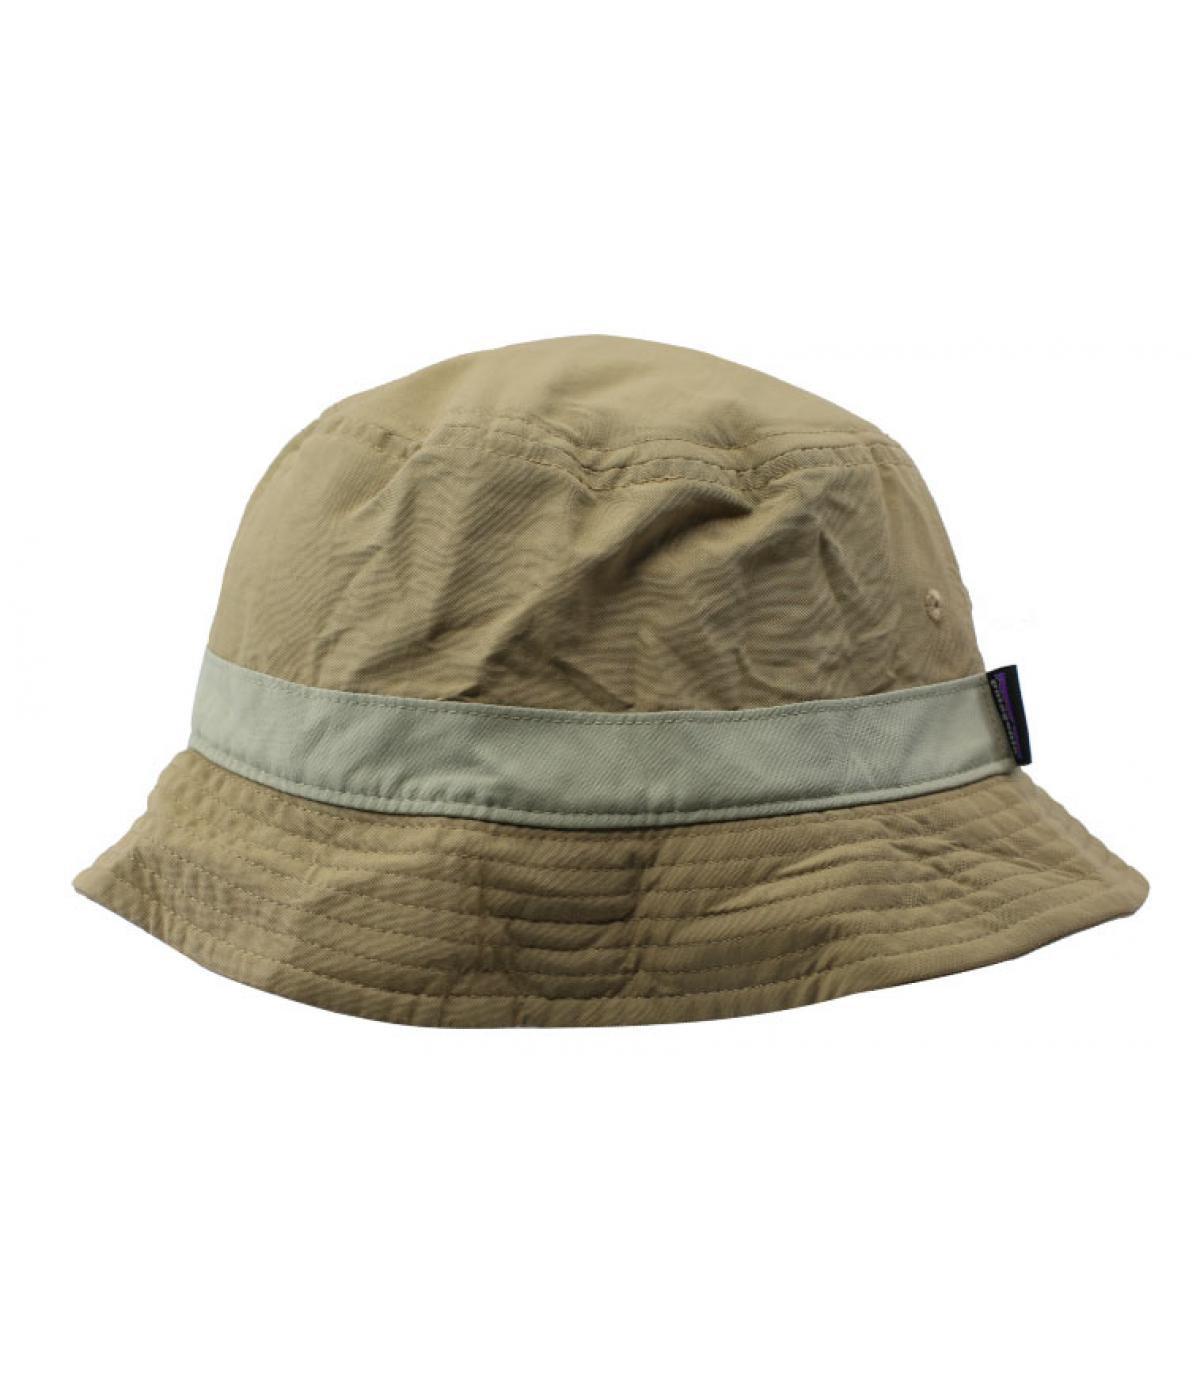 beige Patagonia bucket hat - Wavefarer Bucket ash tan by Patagonia ... 9e2650df5e8c